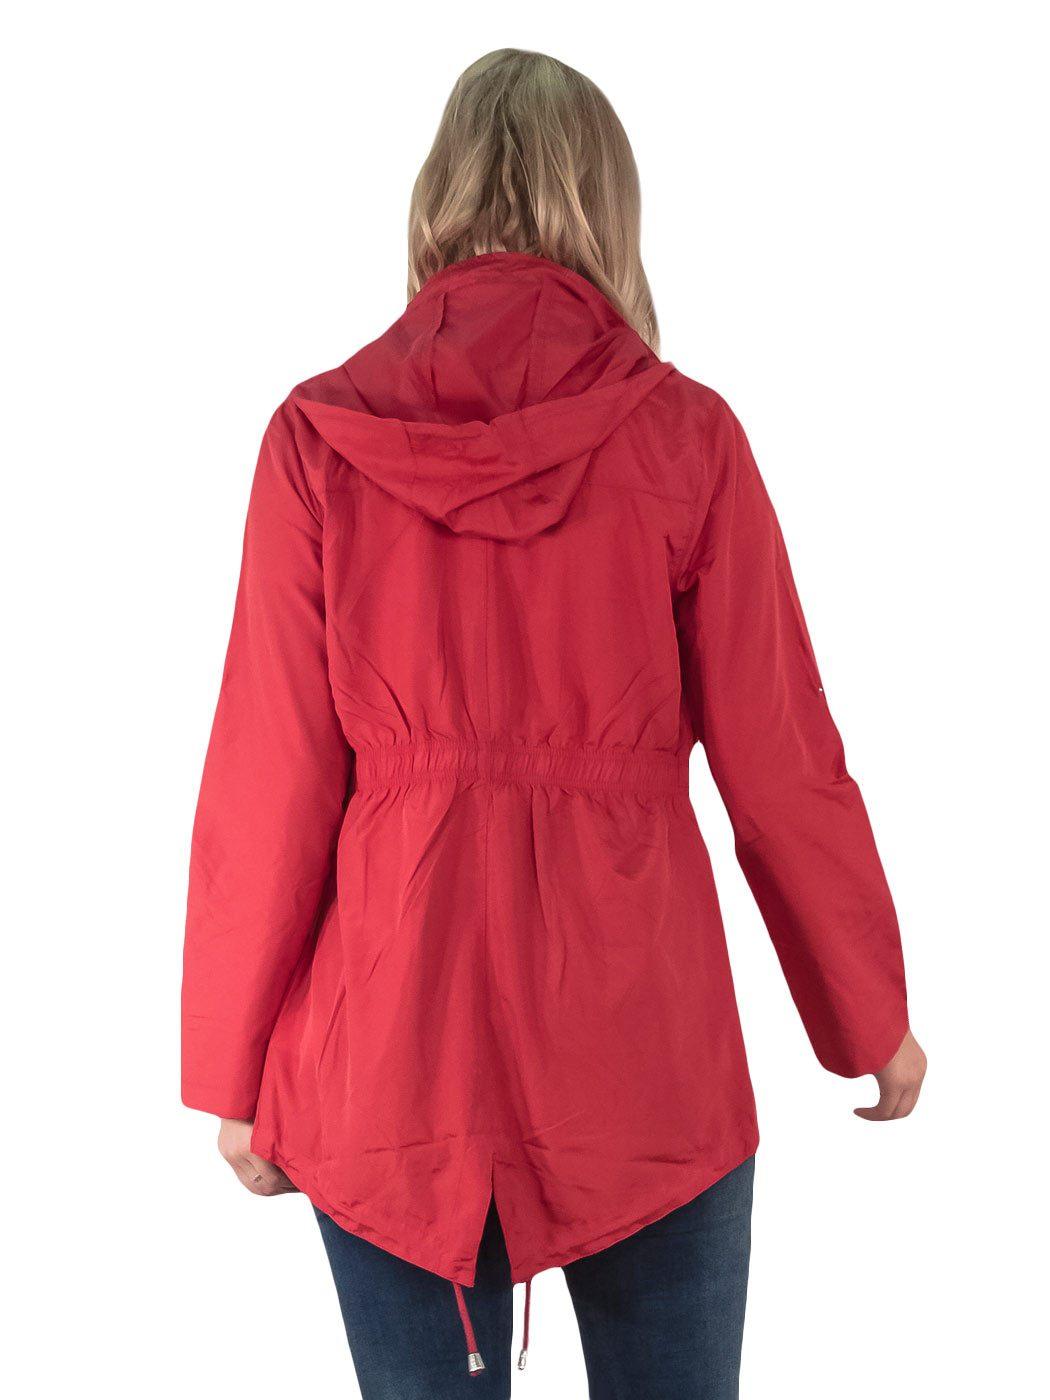 Womens-RainCoat-Plain-Hooded-Ladies-Jacket-Kagool-Parka-Long-Sleeves-Two-Pockets thumbnail 7